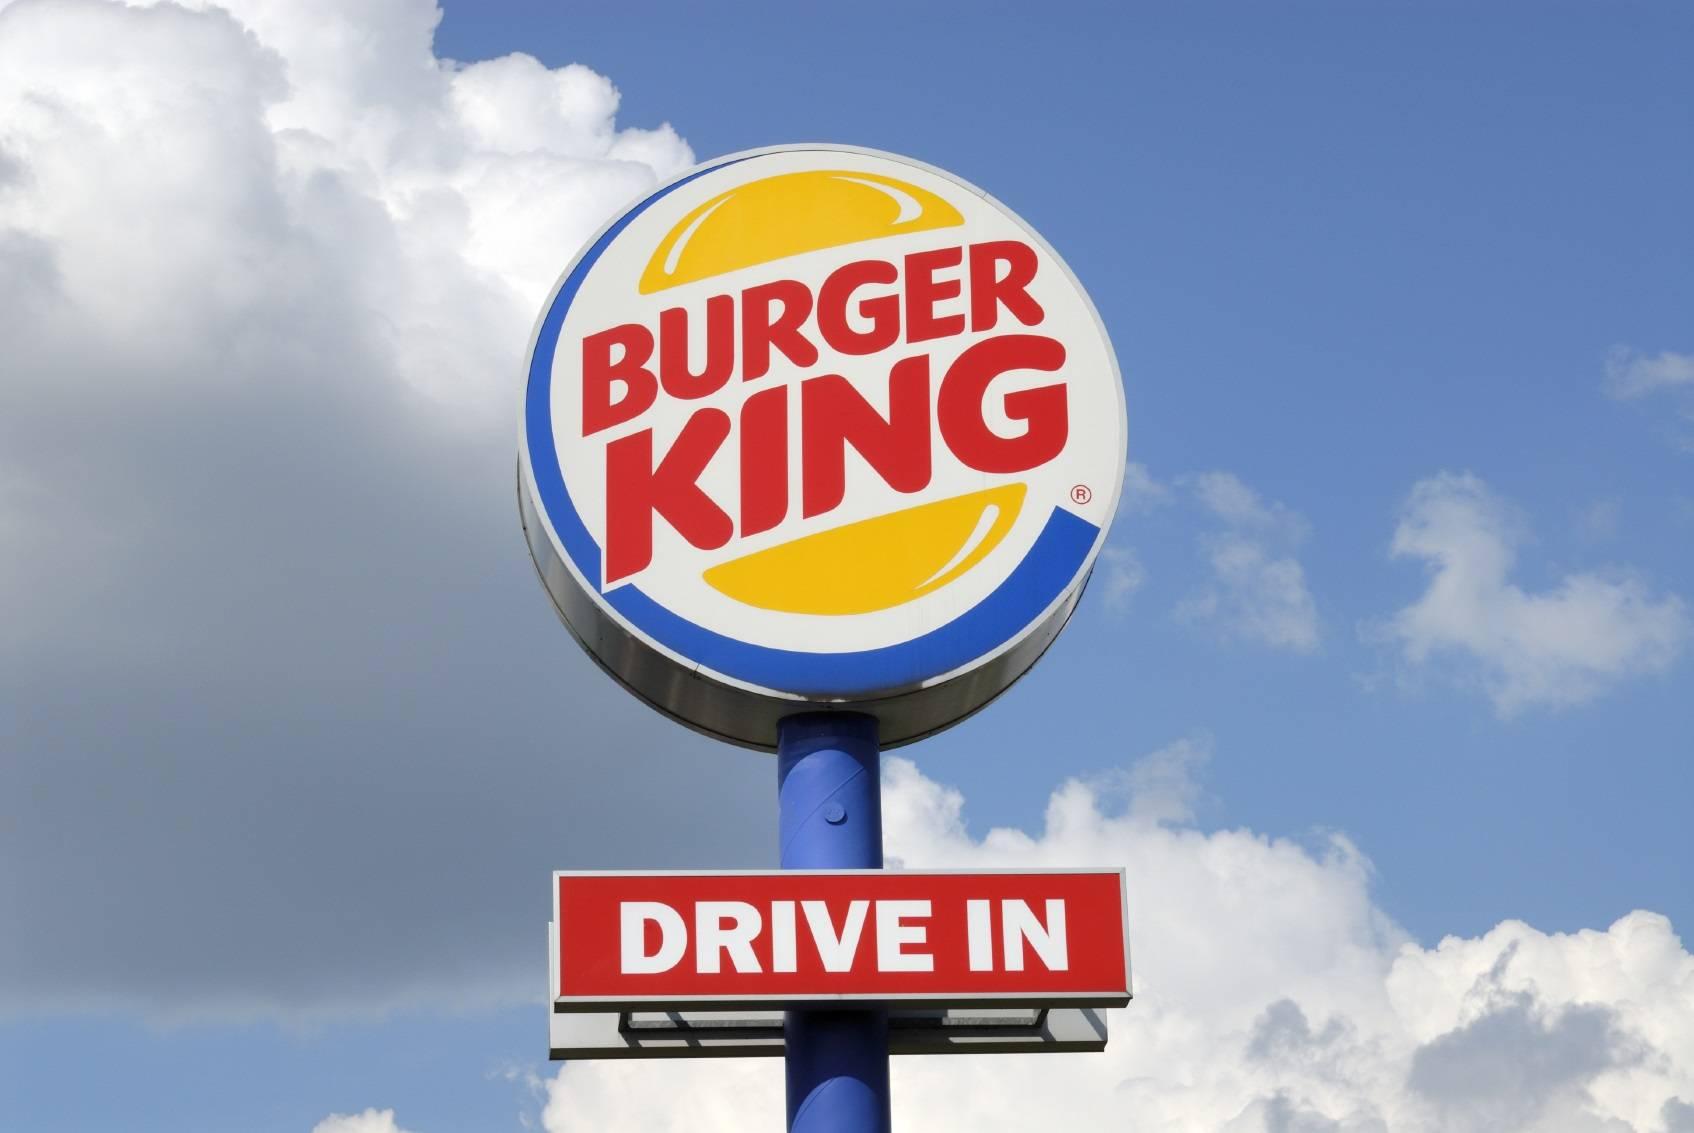 burger king autoris racheter quick en france. Black Bedroom Furniture Sets. Home Design Ideas